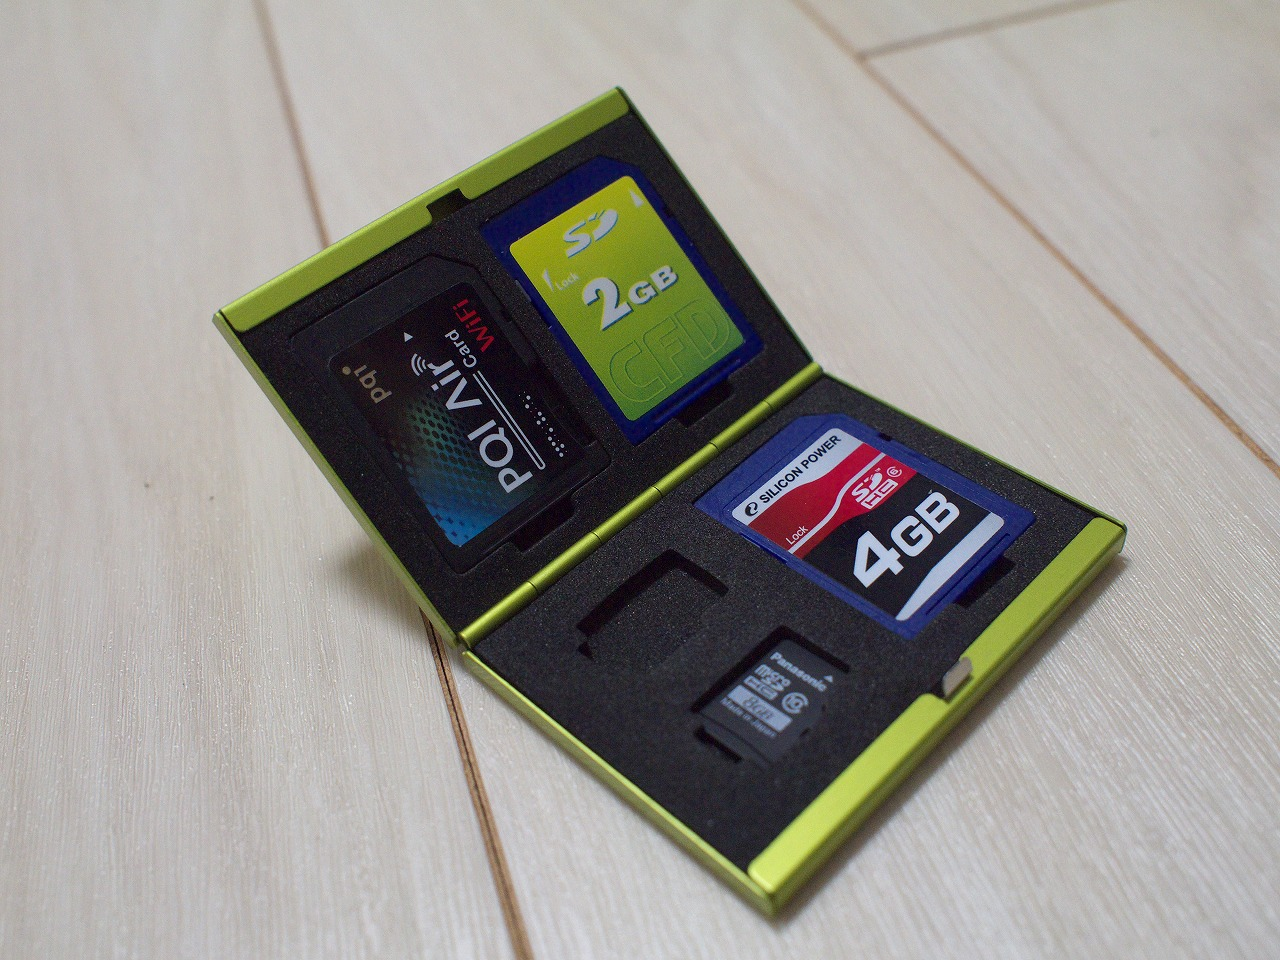 SDカードとmicroSDカードが収納可能